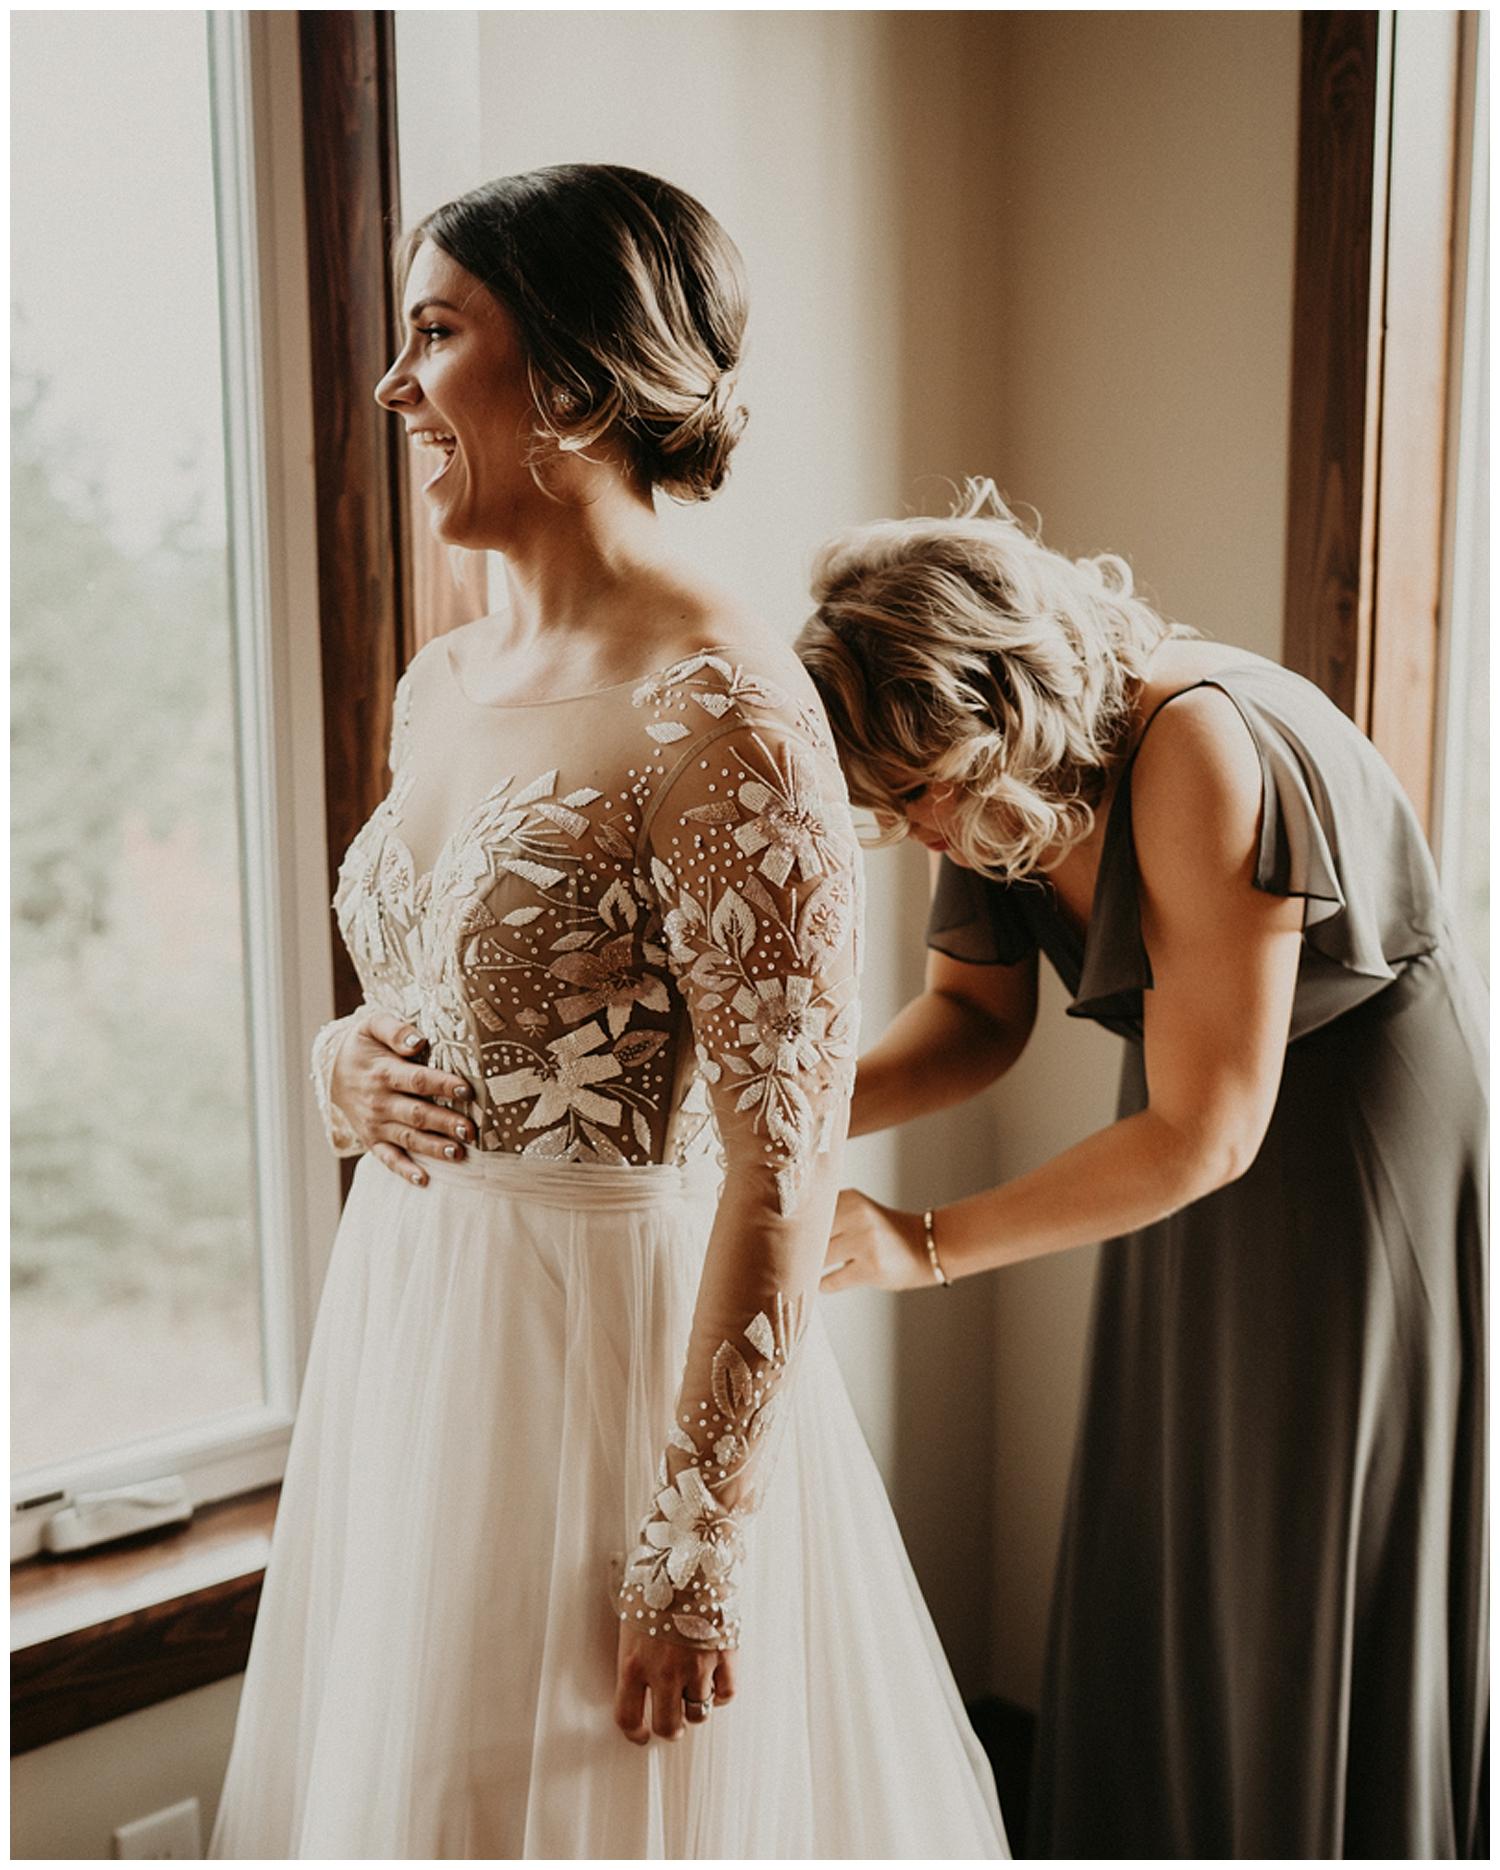 central-washington-wedding-photographer_0041.jpg